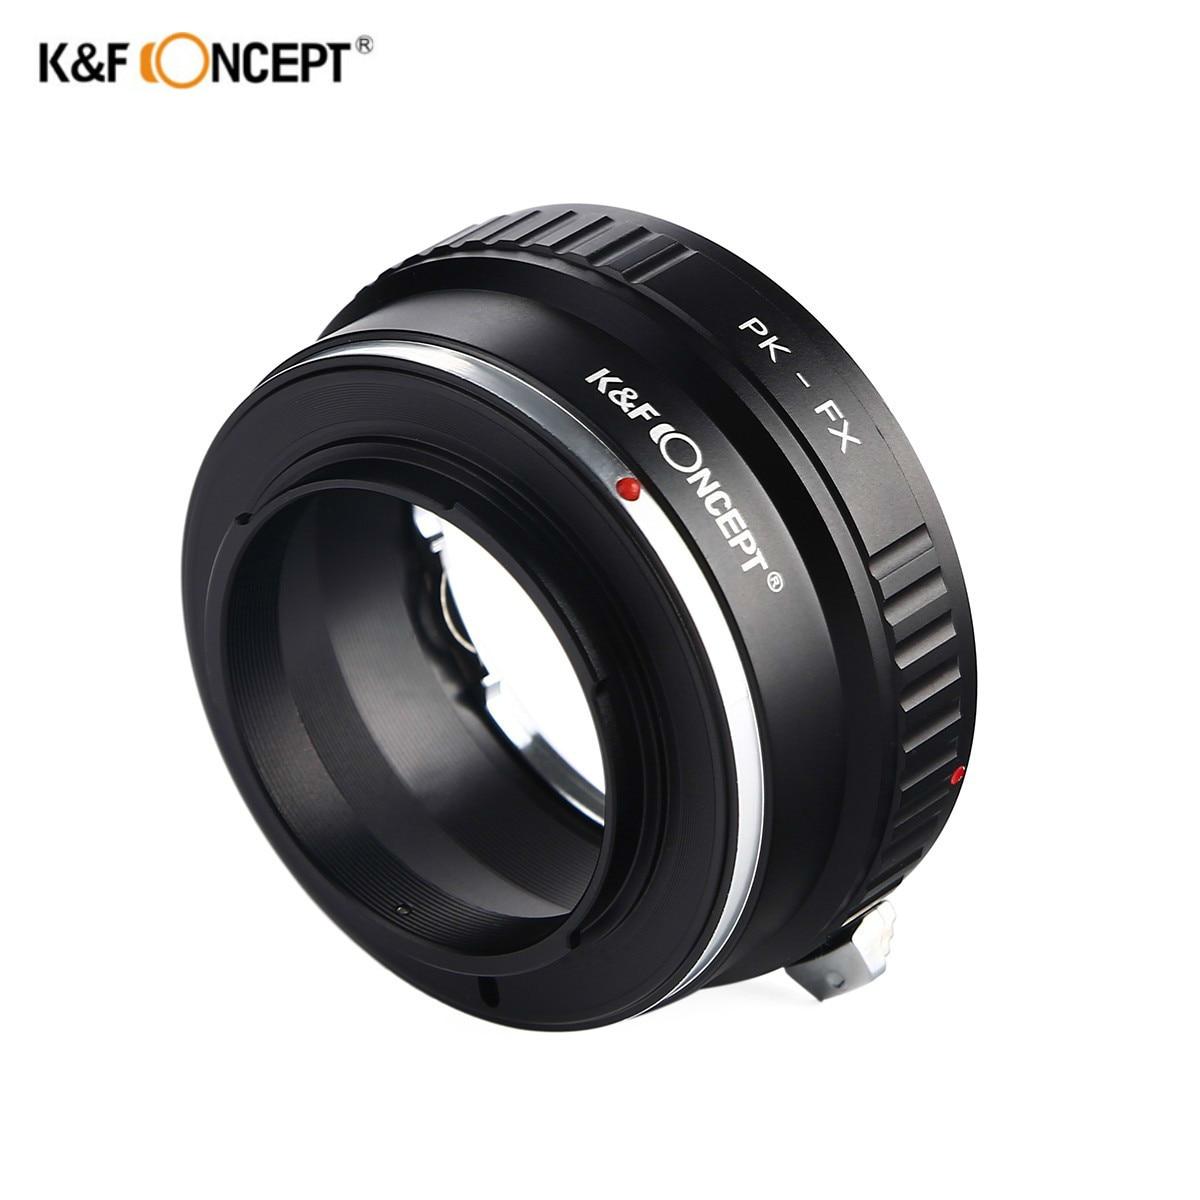 K & F concept PK-FX Adaptadores para objetivos anillo para Pentax PK lente a Fujifilm x montaje Fuji x-pro1 Cámara